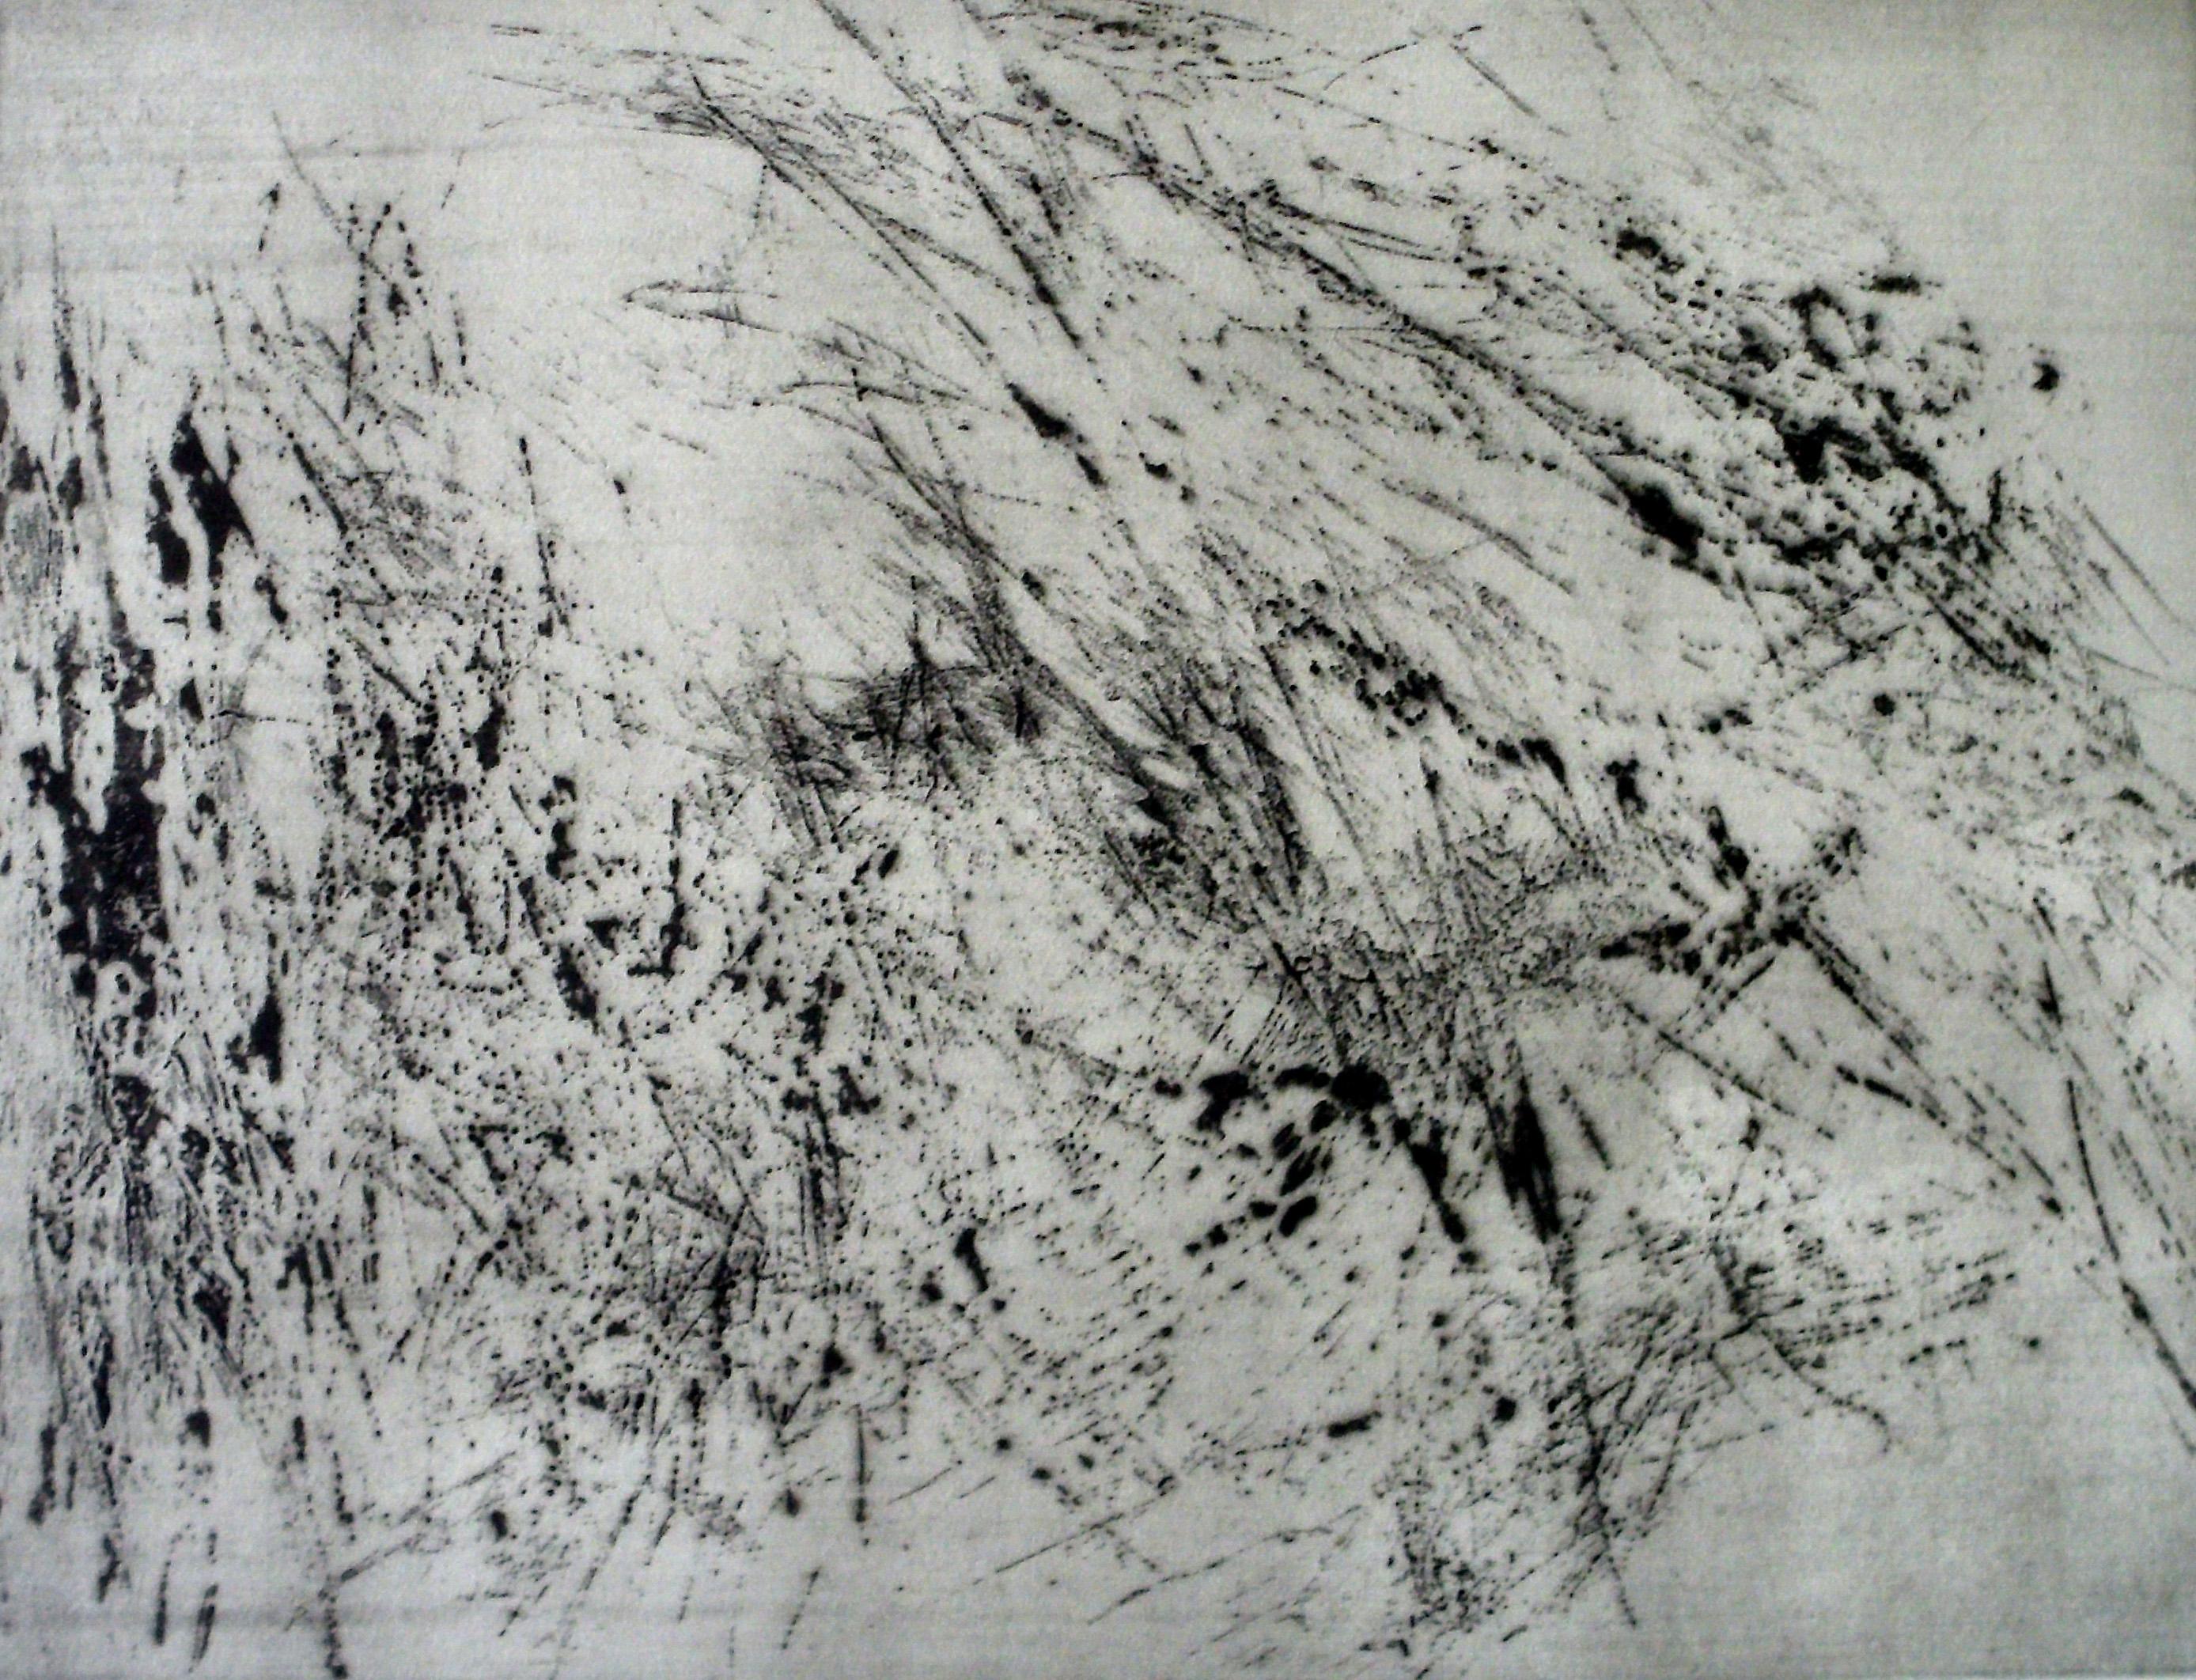 03-kerstin_franke-gneuss-verweht-2012-reservage-45.1x64.4